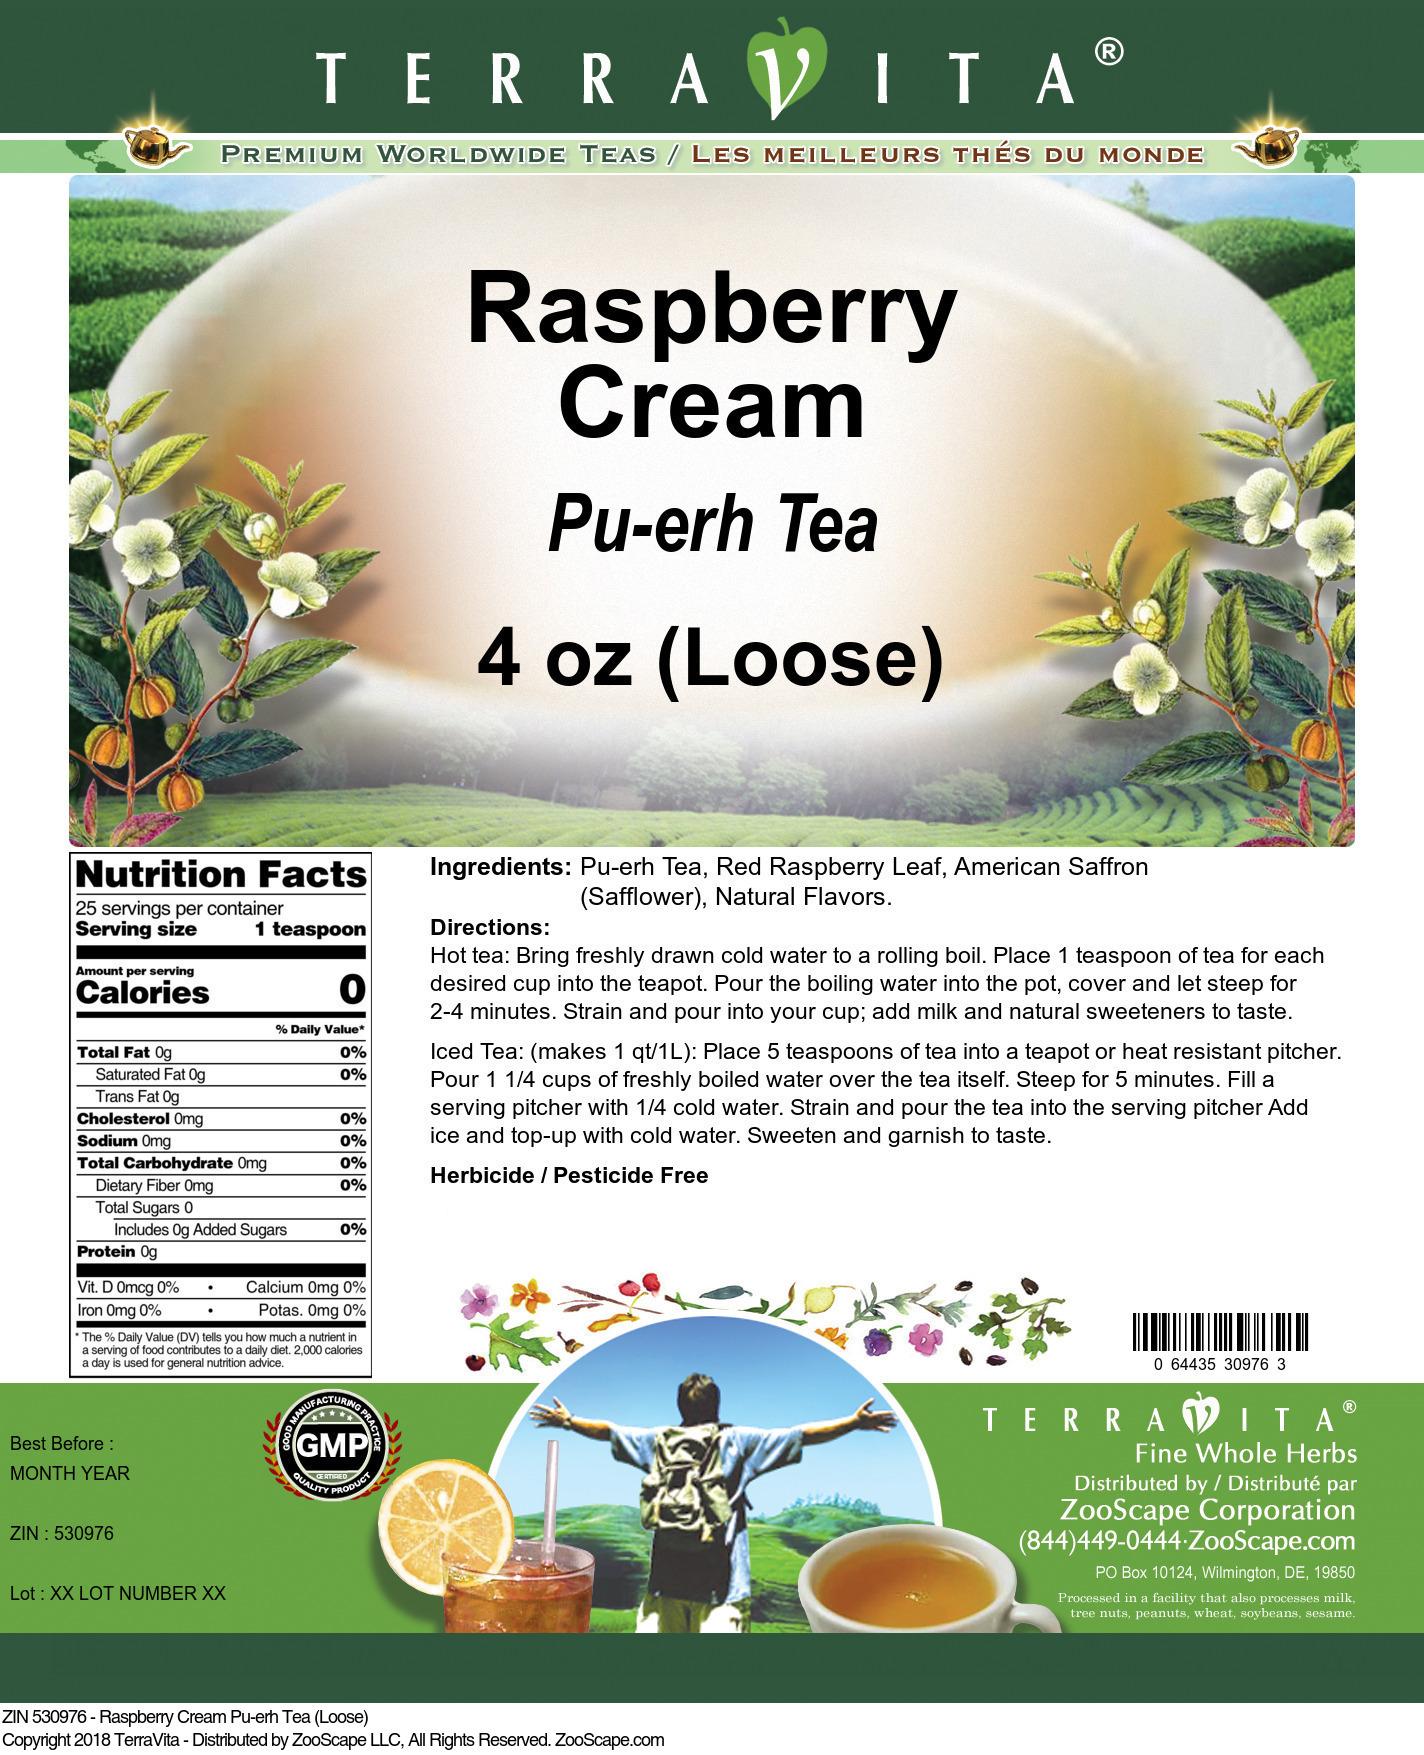 Raspberry Cream Pu-erh Tea